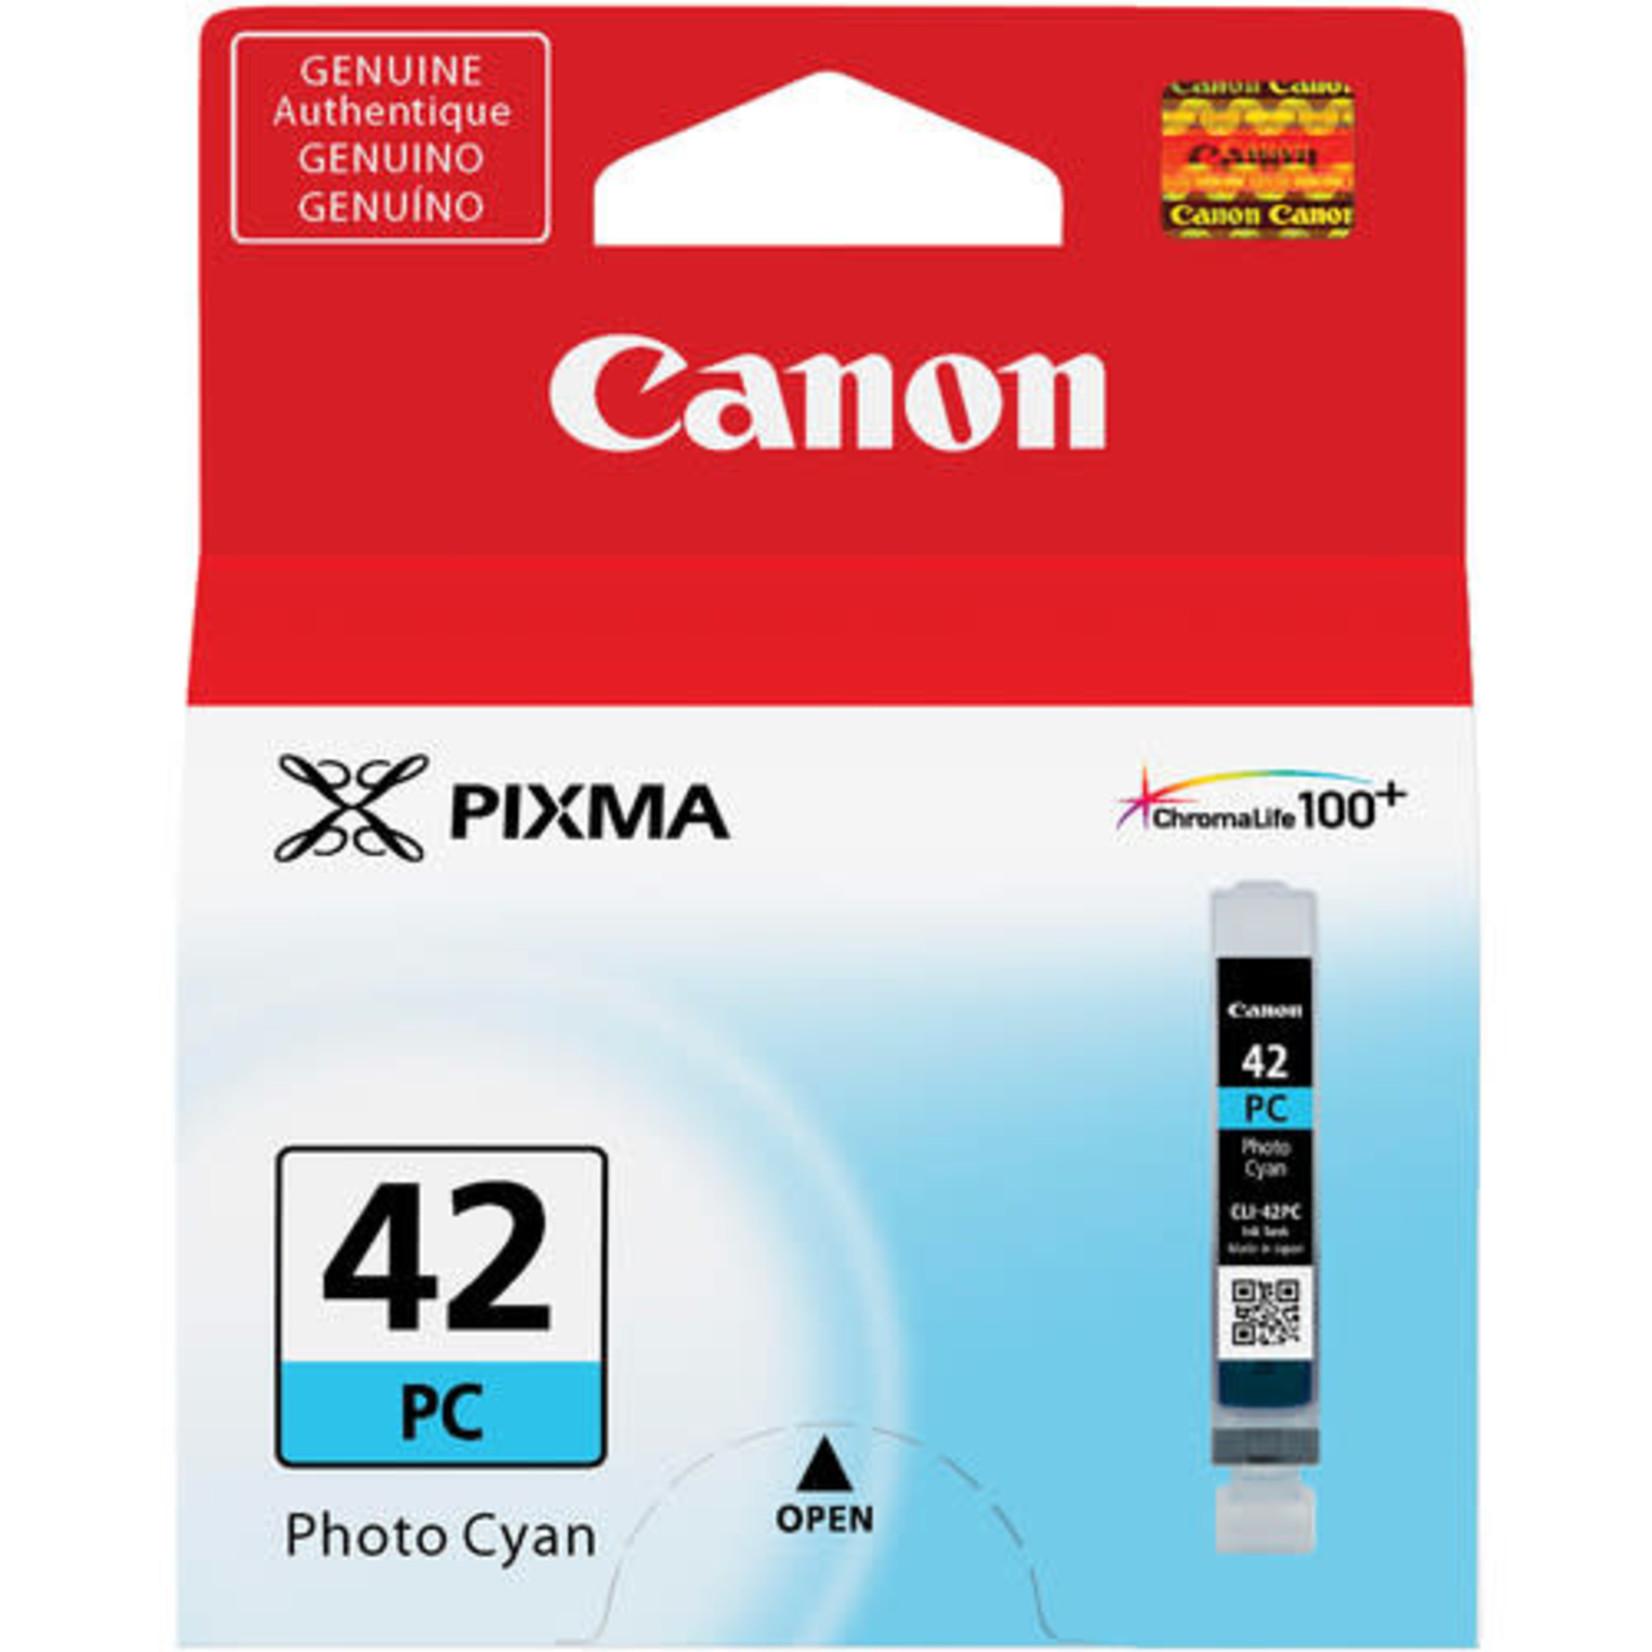 Canon Canon CLI-42 Photo Cyan Ink Cartridge